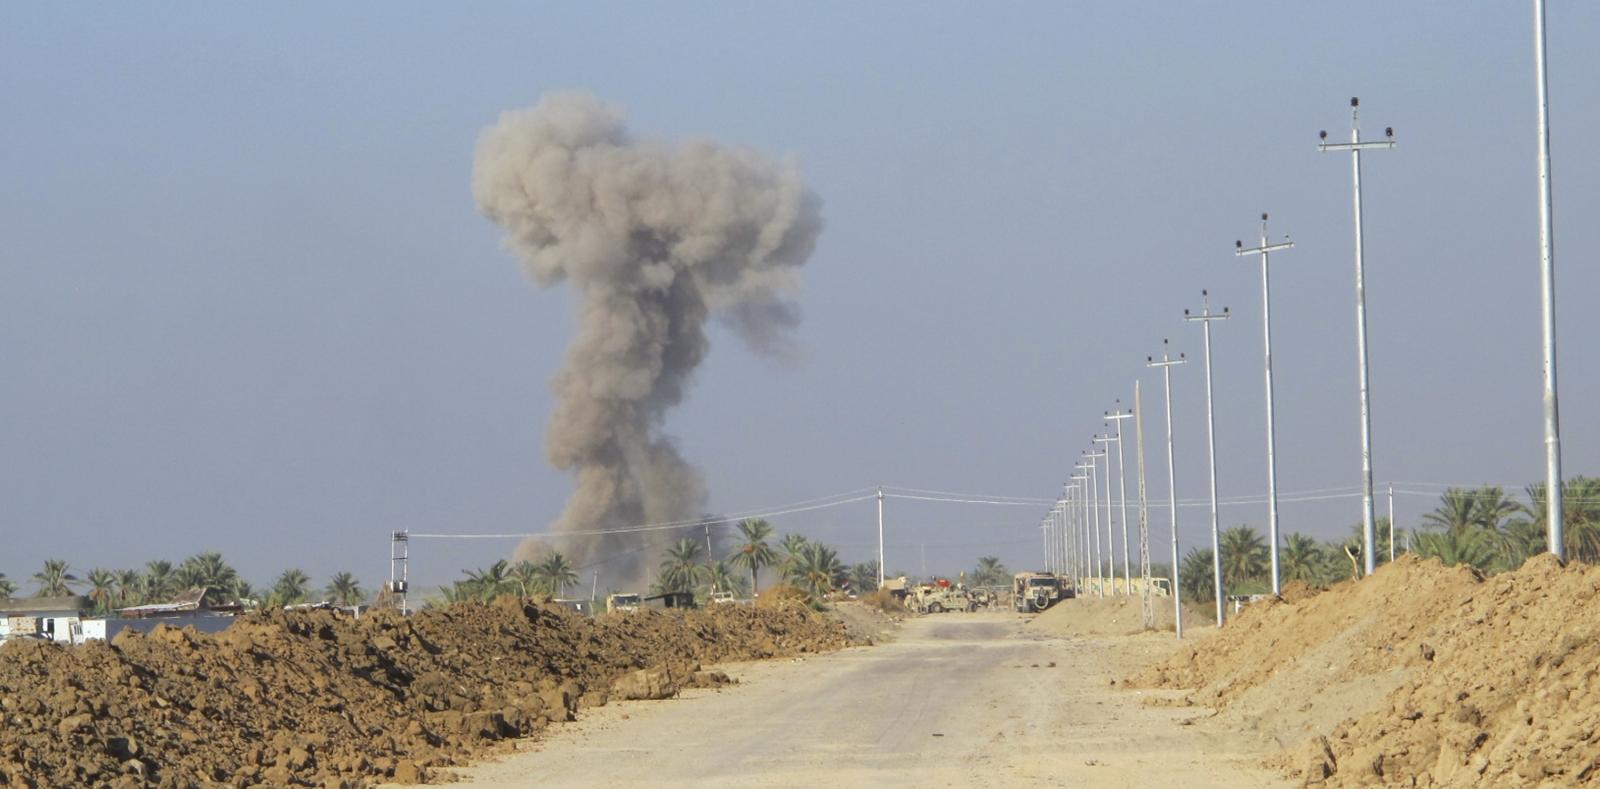 Jurf al-Sakhar Baghdad ISIS